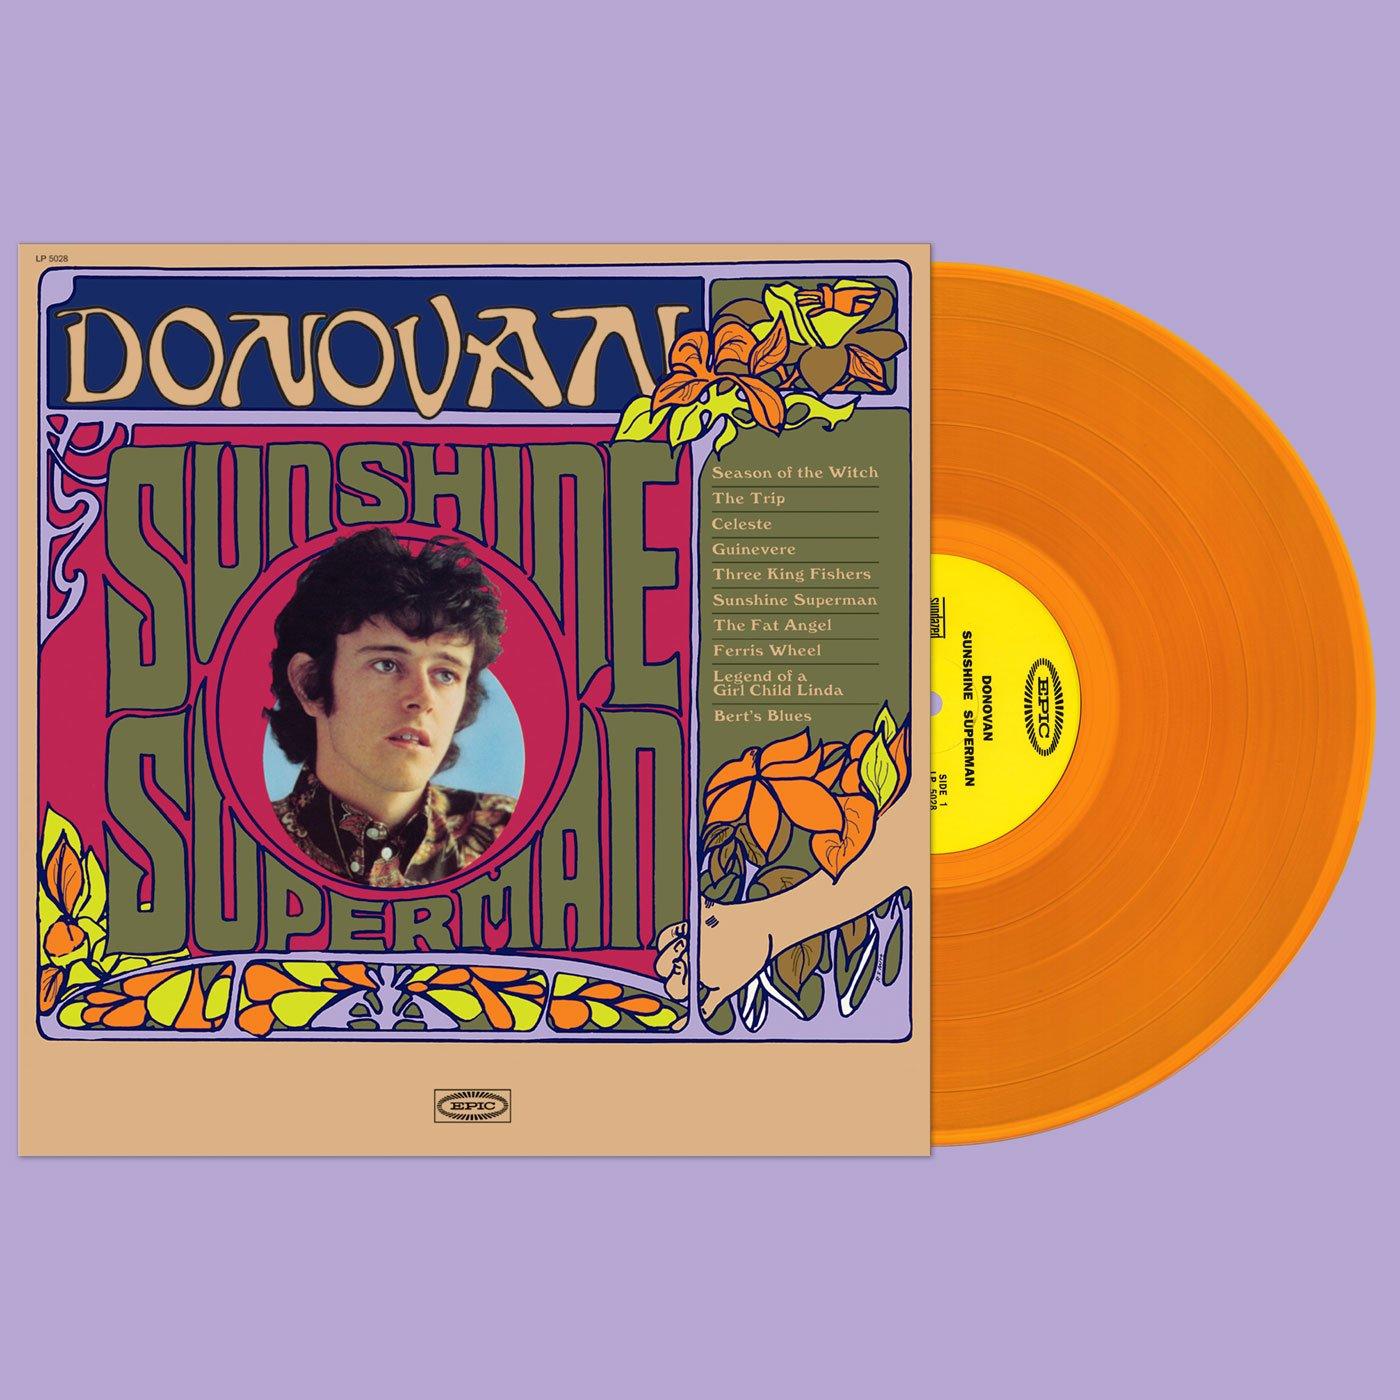 Donovan - Sunshine Superman (LP - Gold Vinyl)